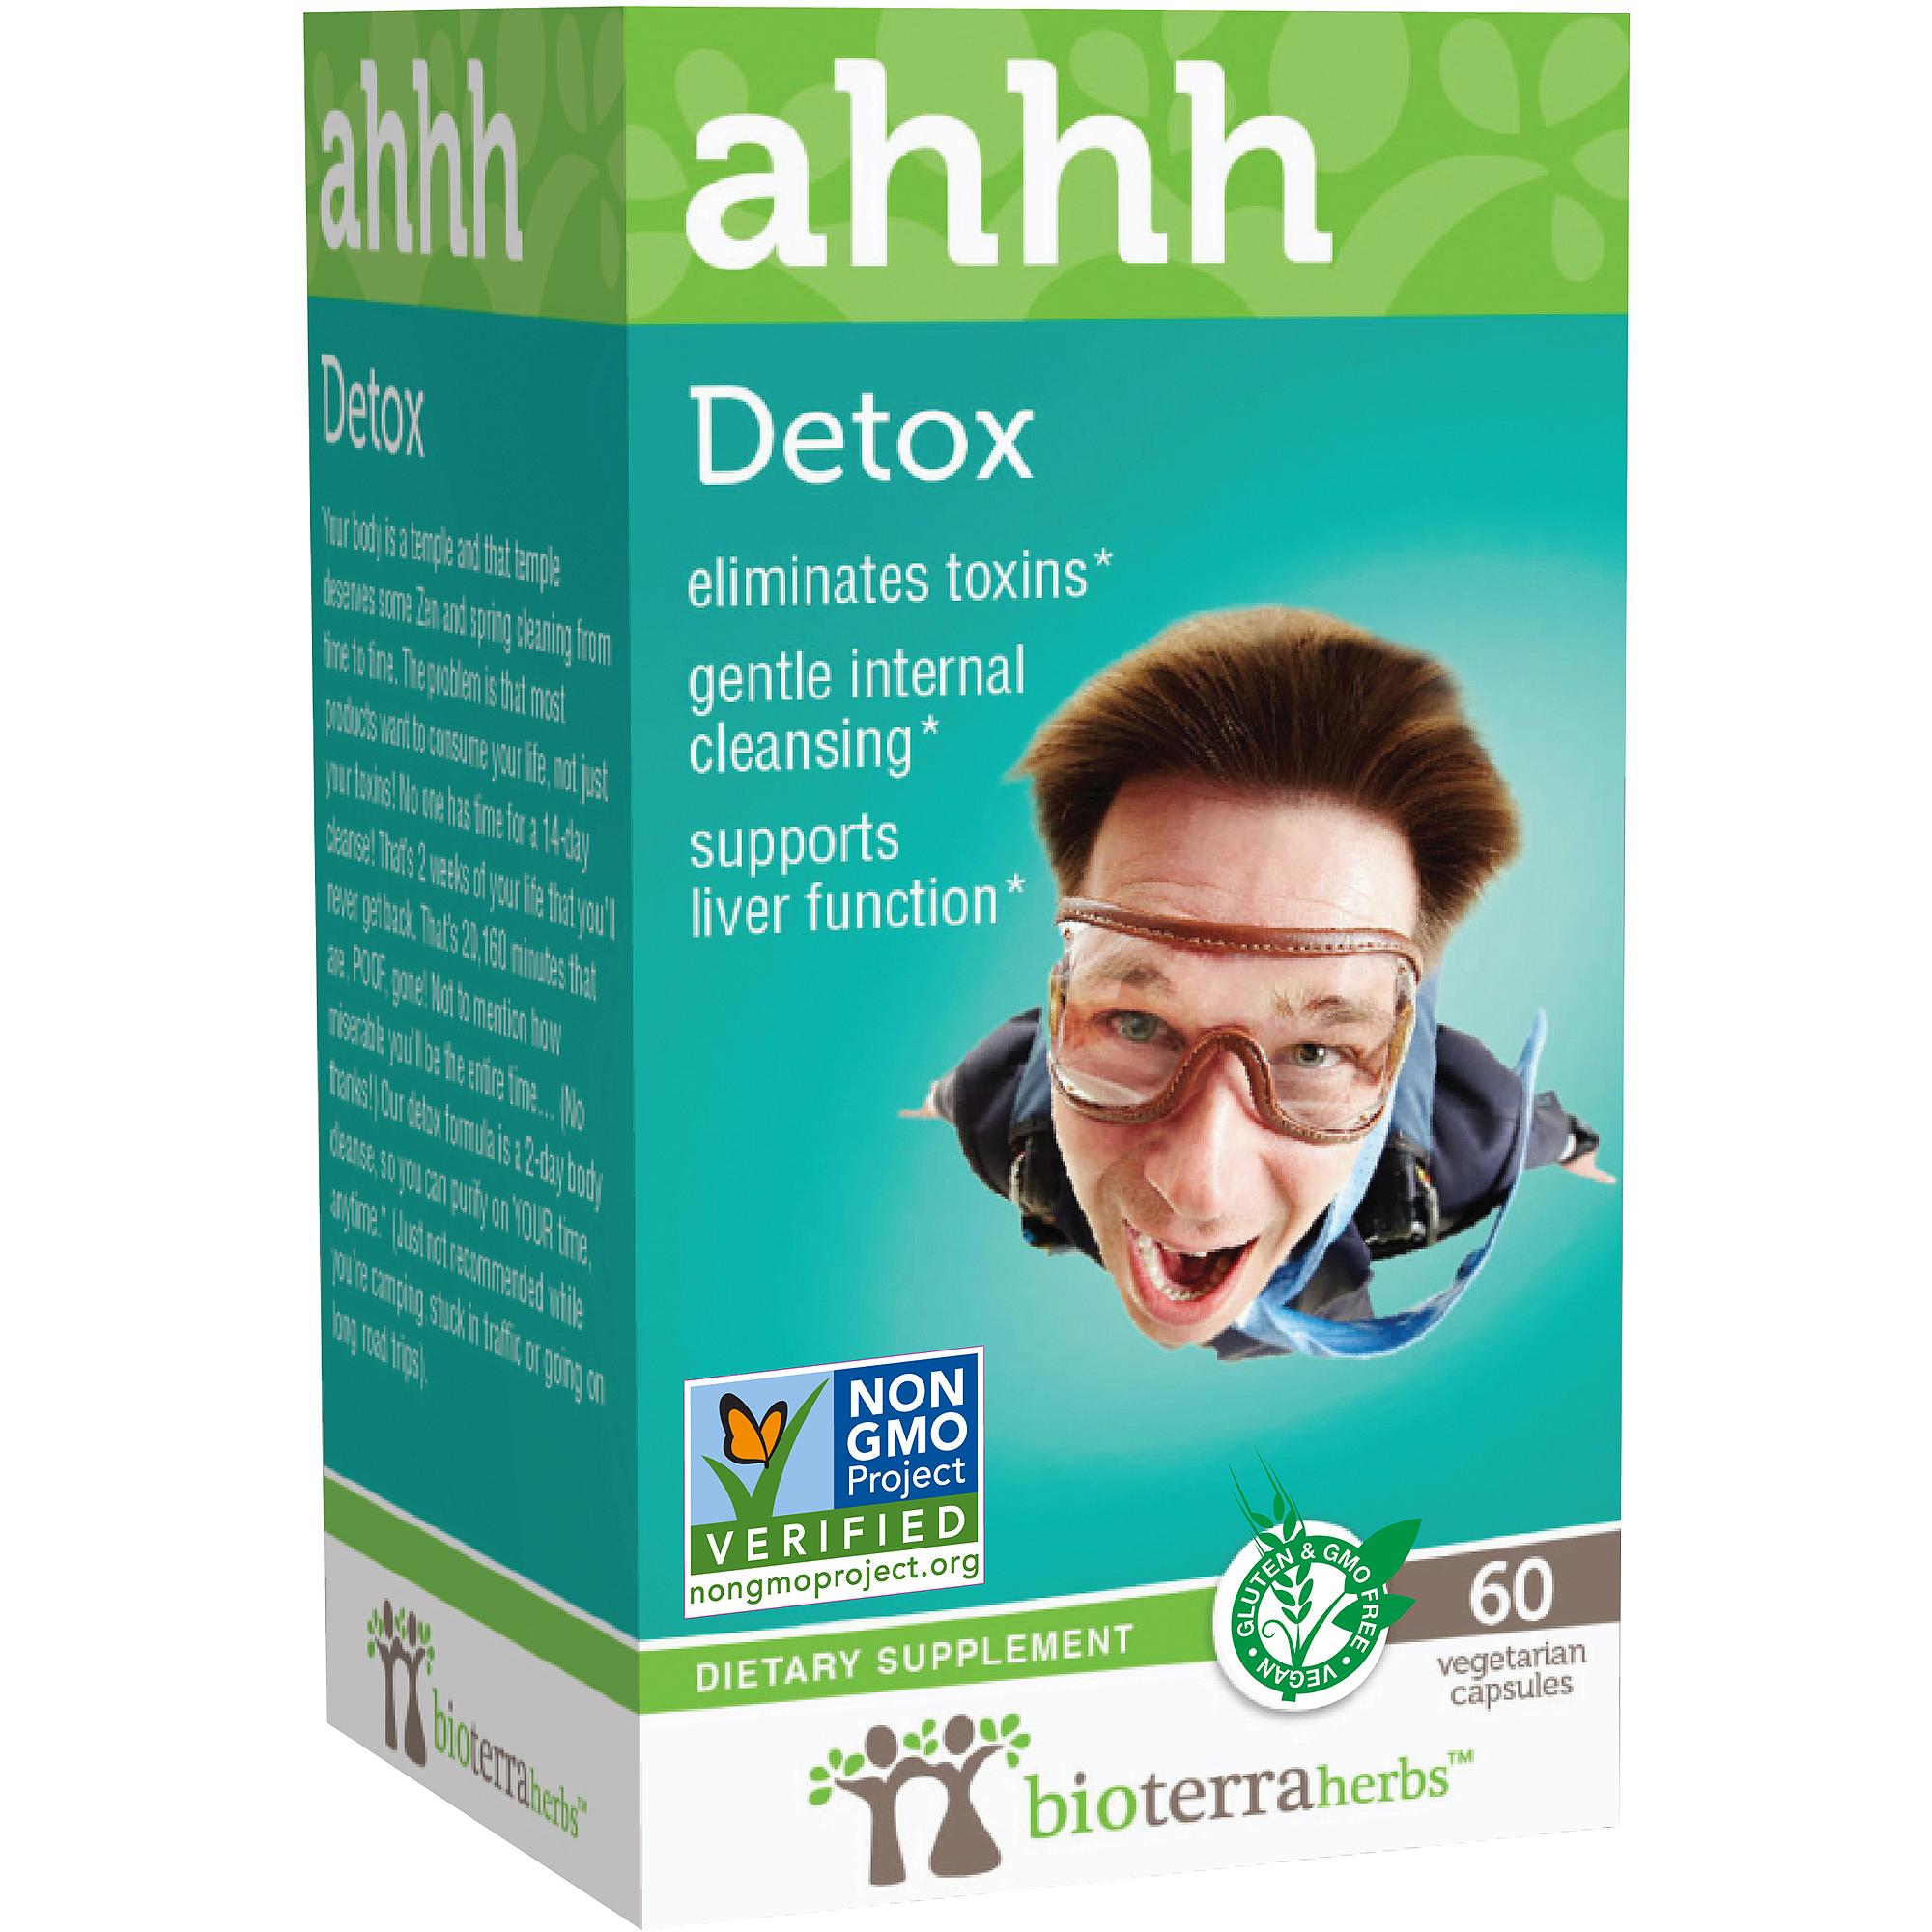 BioTerra Herbs Detox ahhh Dietary Supplement Vegetarian Capsules, 60 count